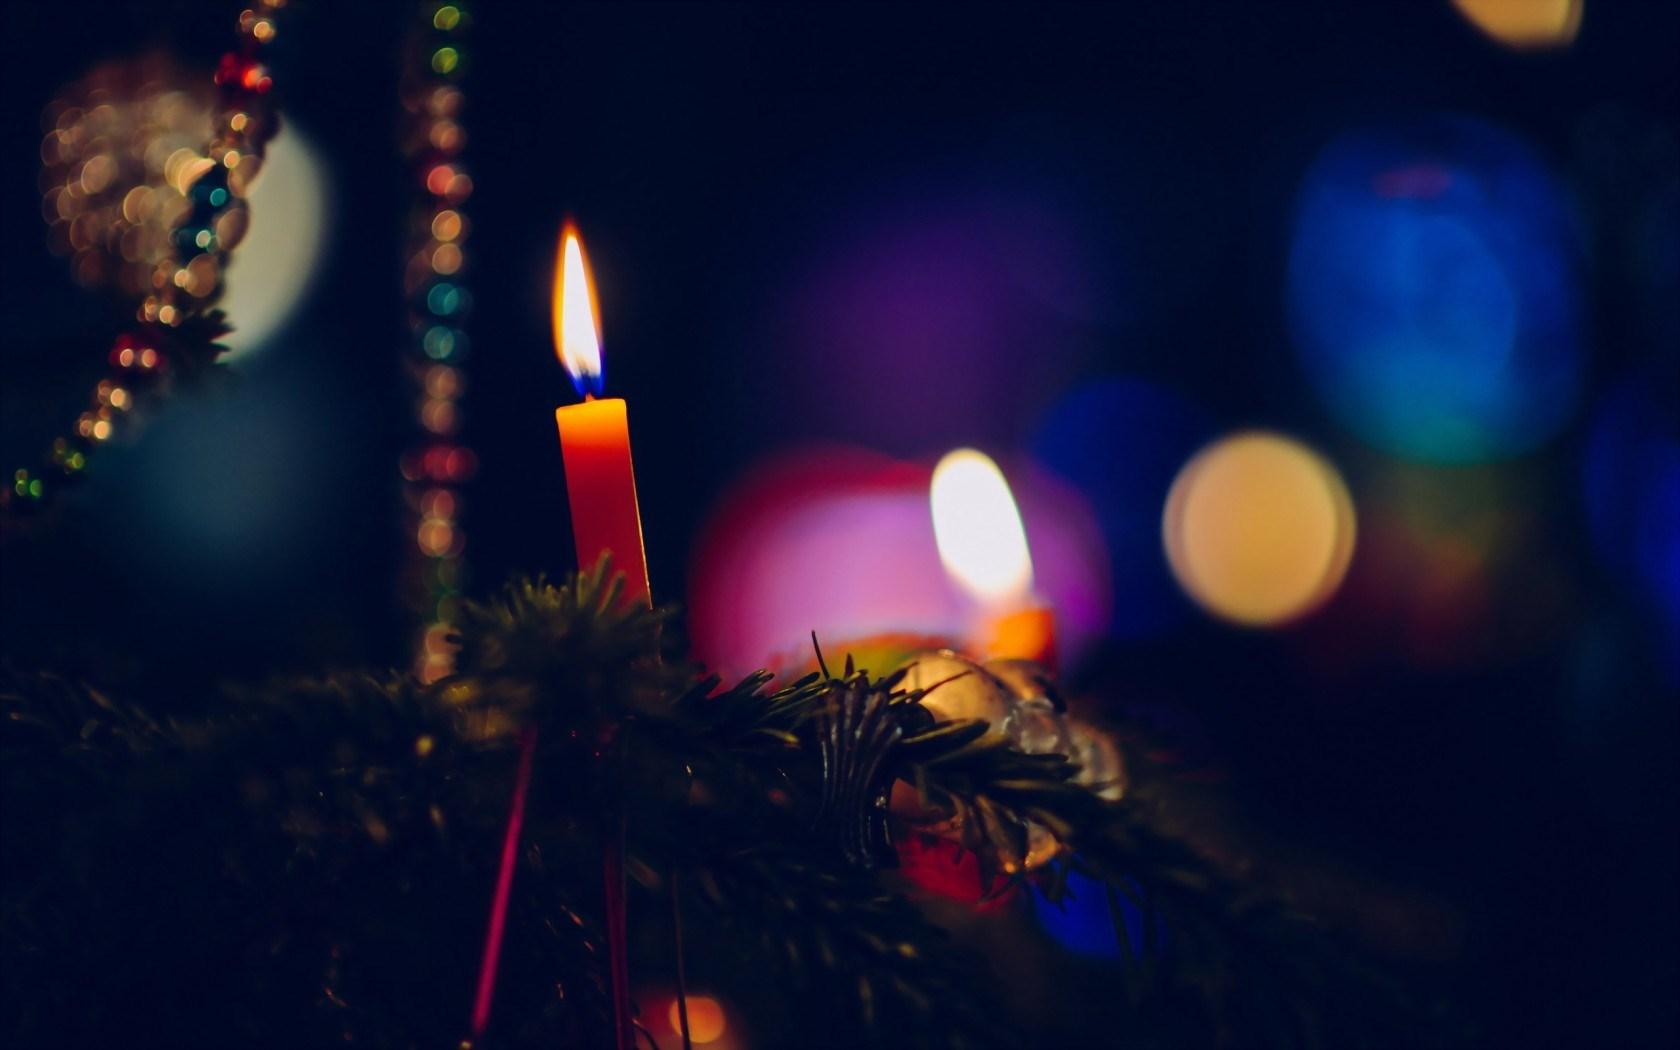 Christmas Trees Candles Images Wallpaper Wallpapersafari